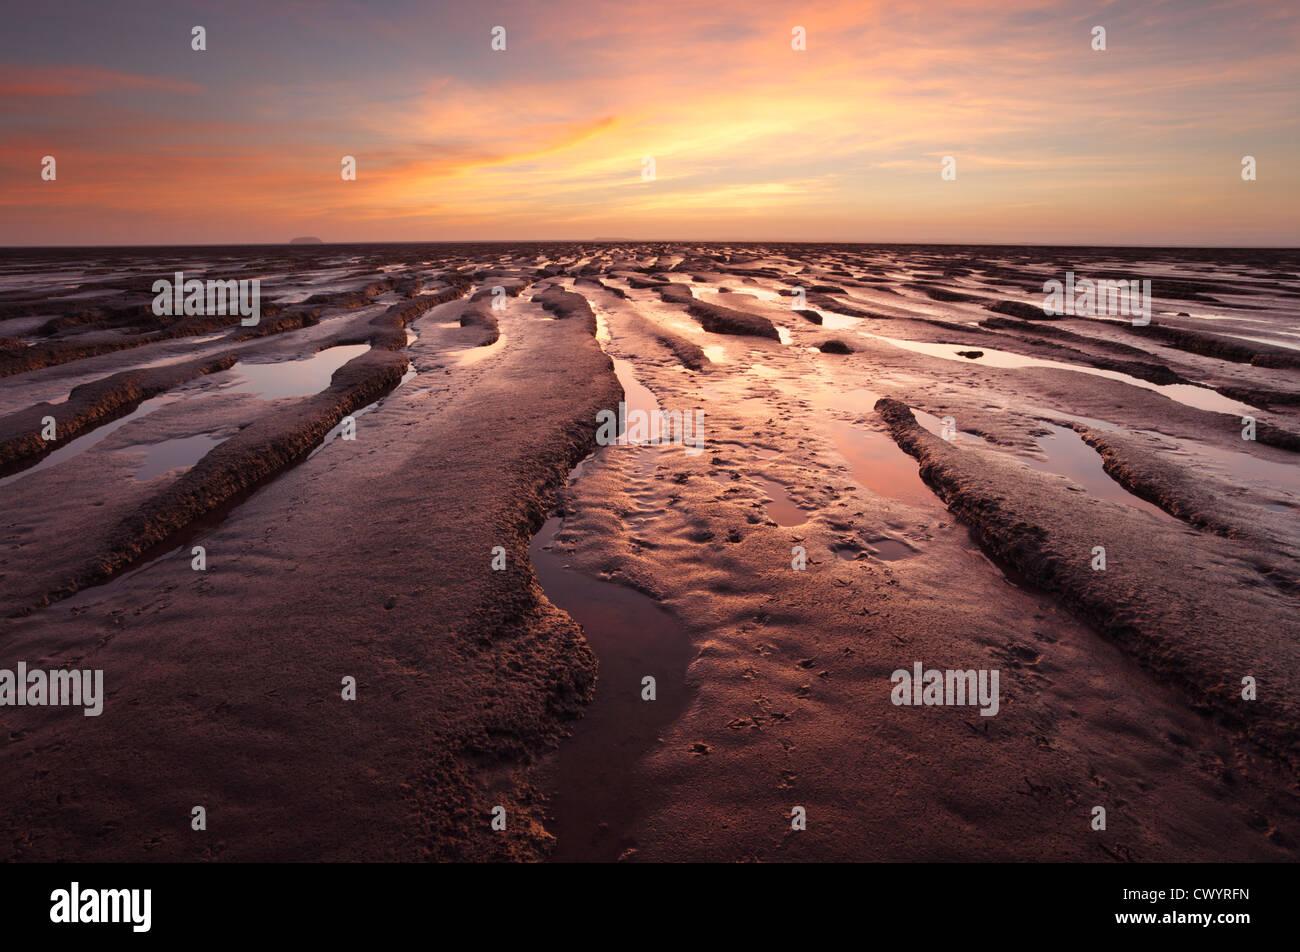 Mudflats at Sand Bay near Weston-super-Mare. Somerset. England. UK. - Stock Image